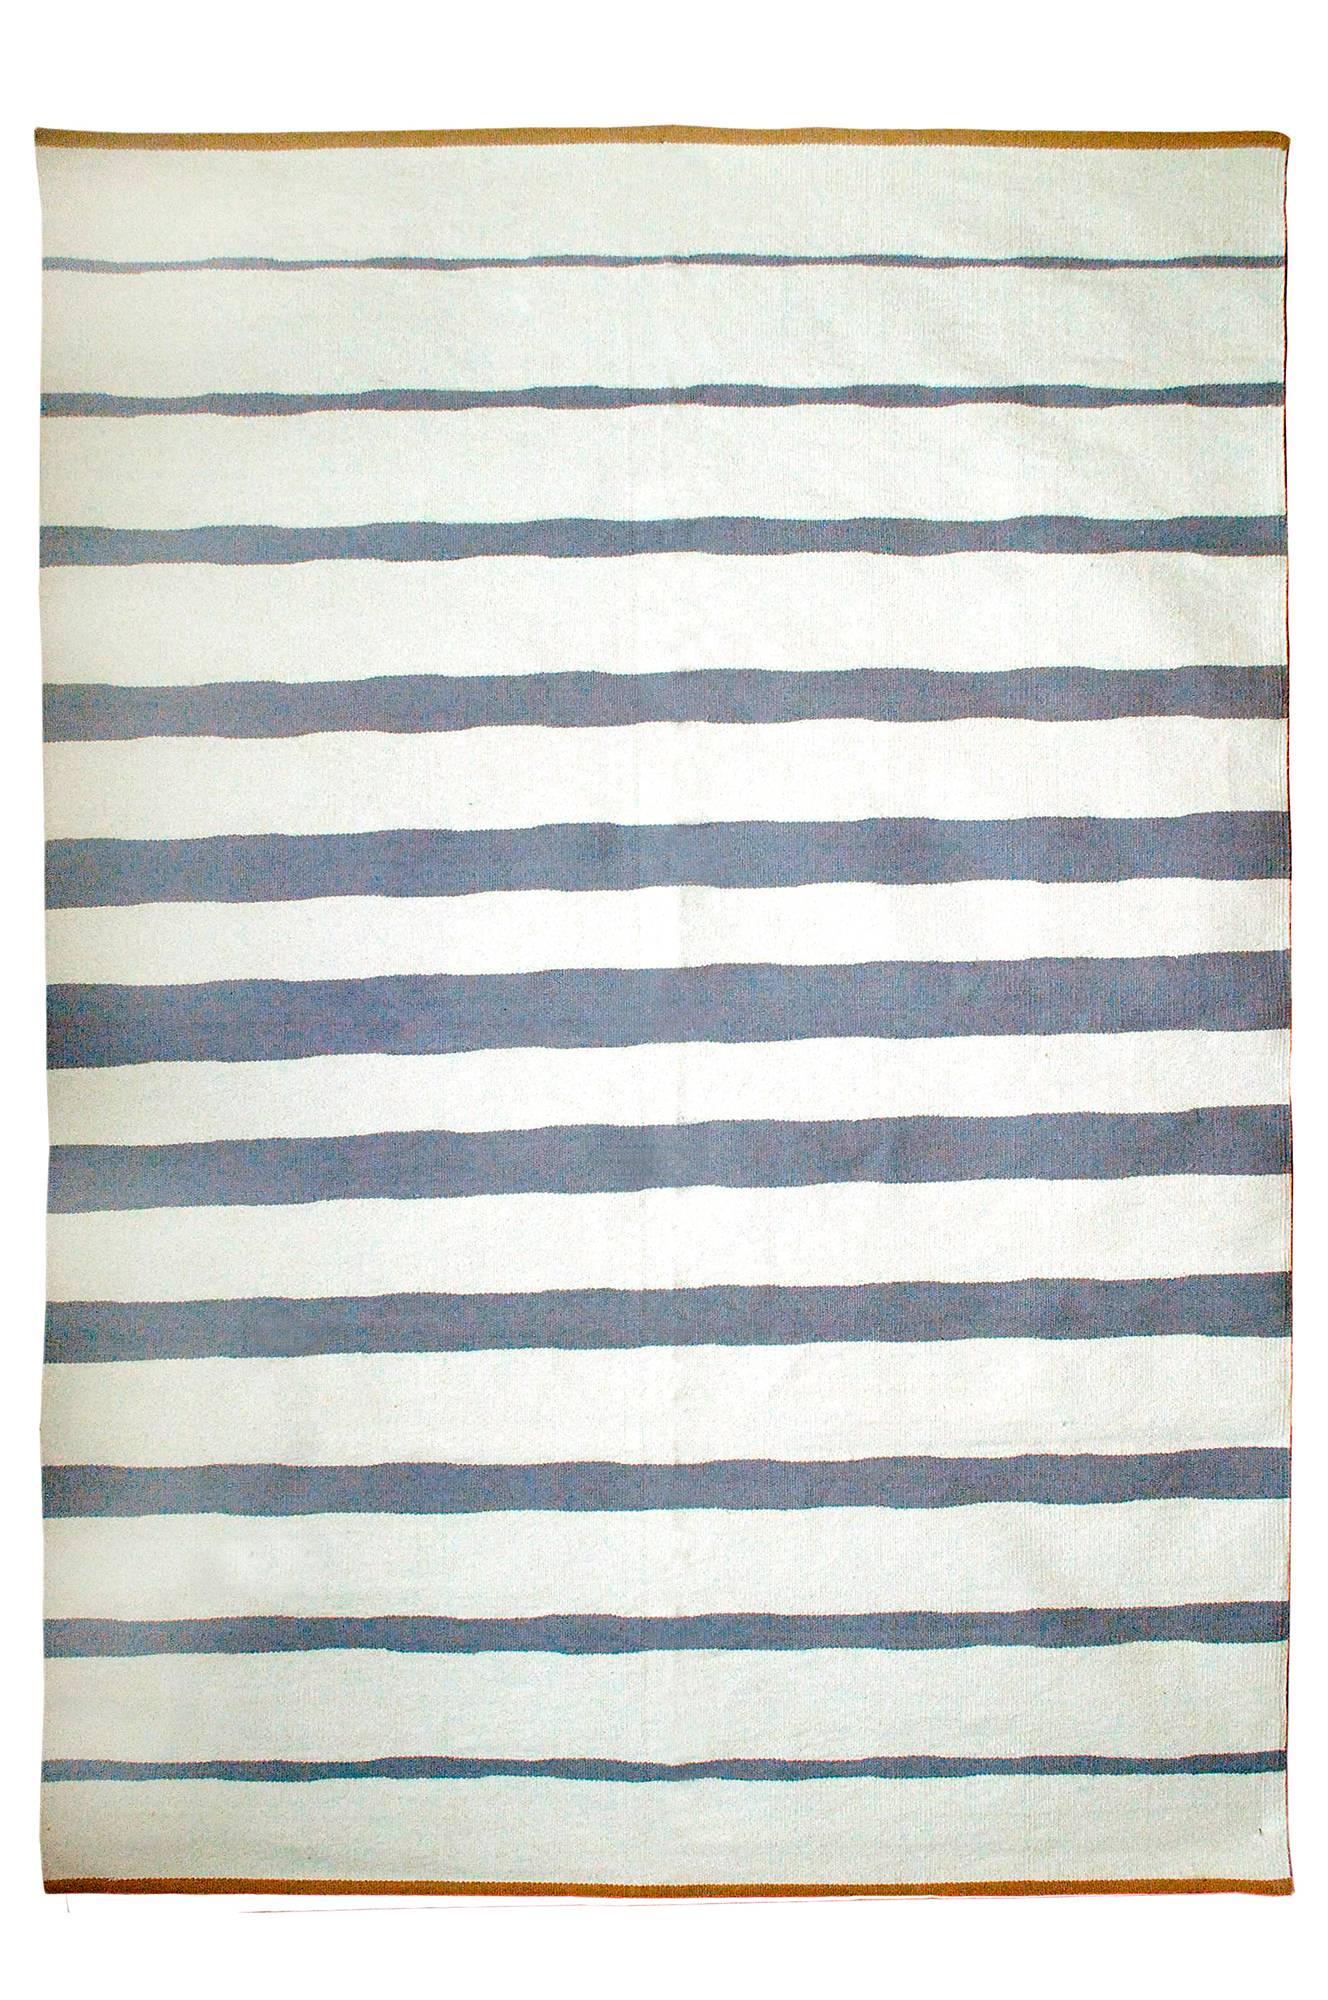 Roppongi-matto 170x230 cm